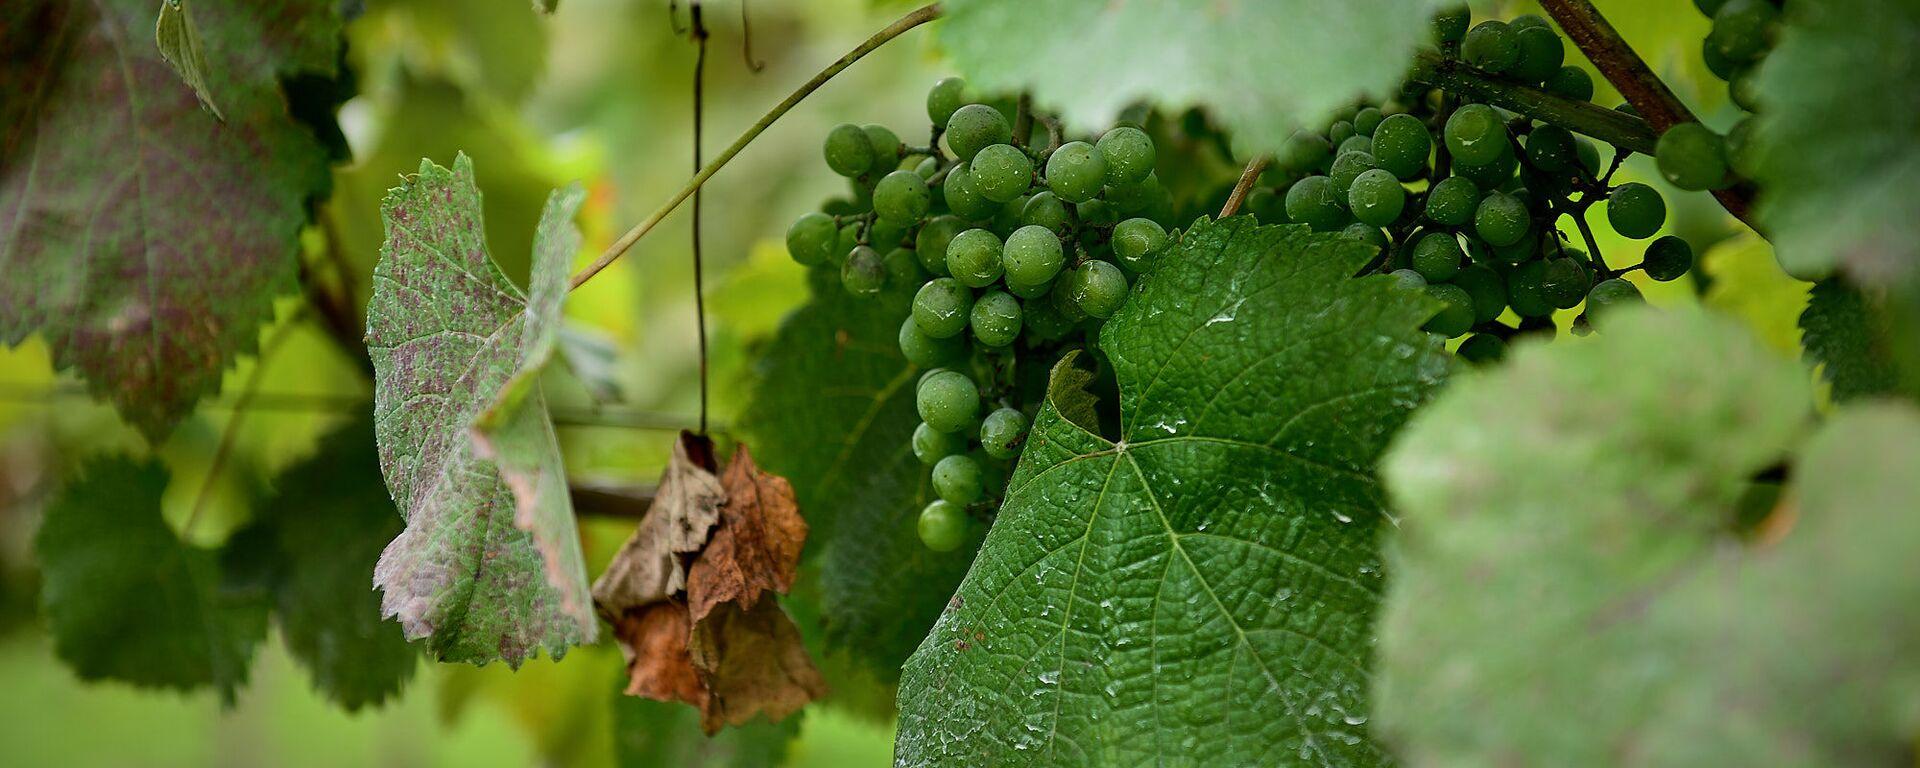 Виноград в винограднике - Sputnik Грузия, 1920, 27.08.2021